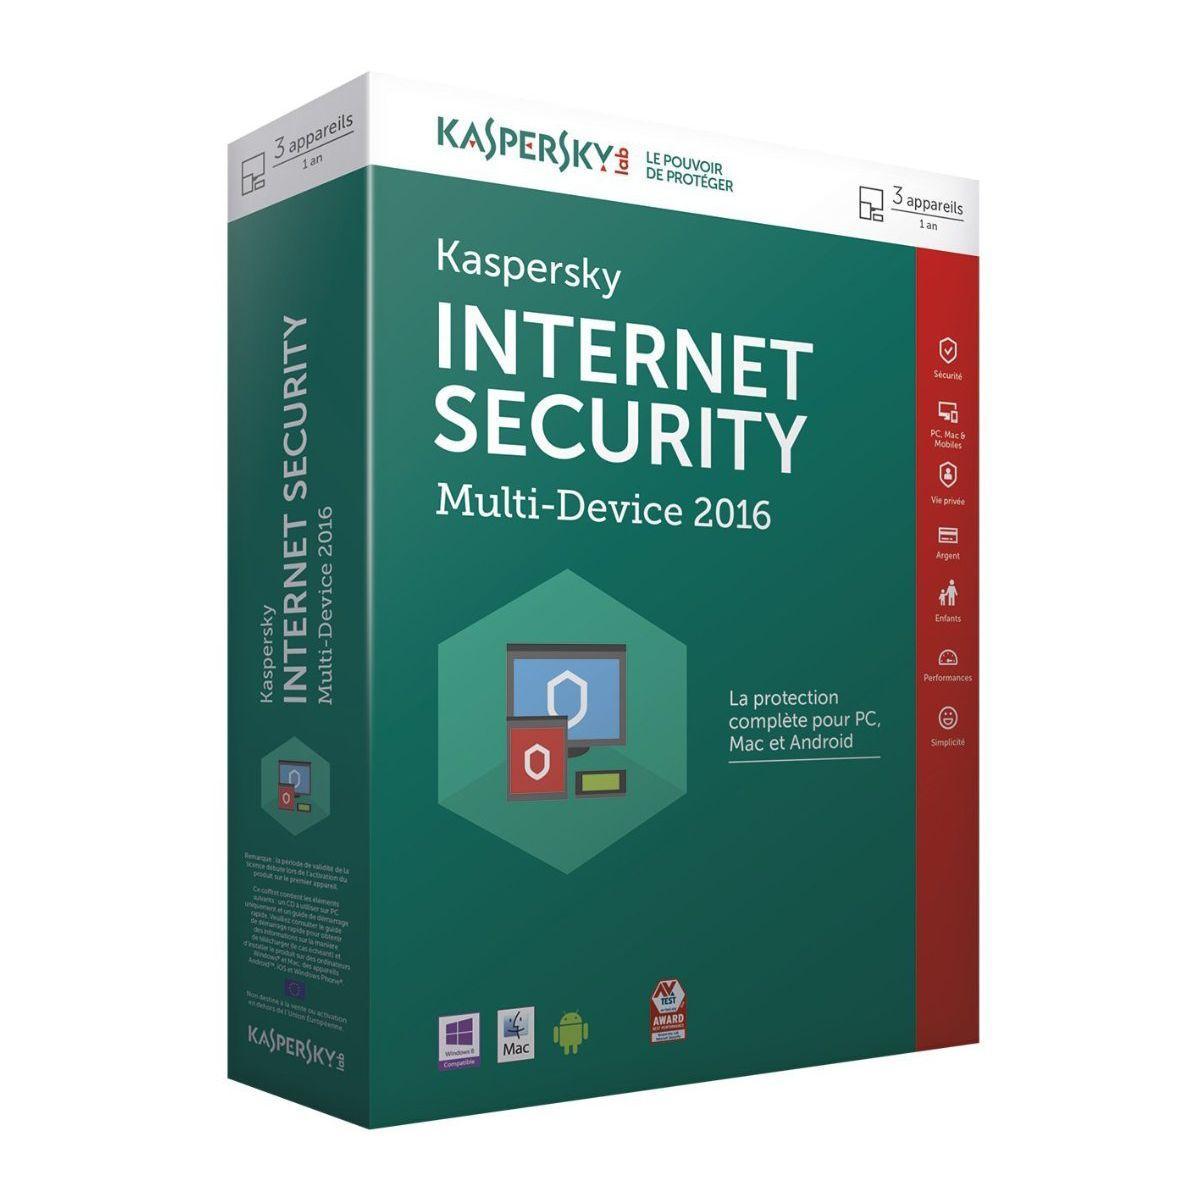 Logiciel pc kaspersky internet security 2016 – 10 € de remise : code cash10